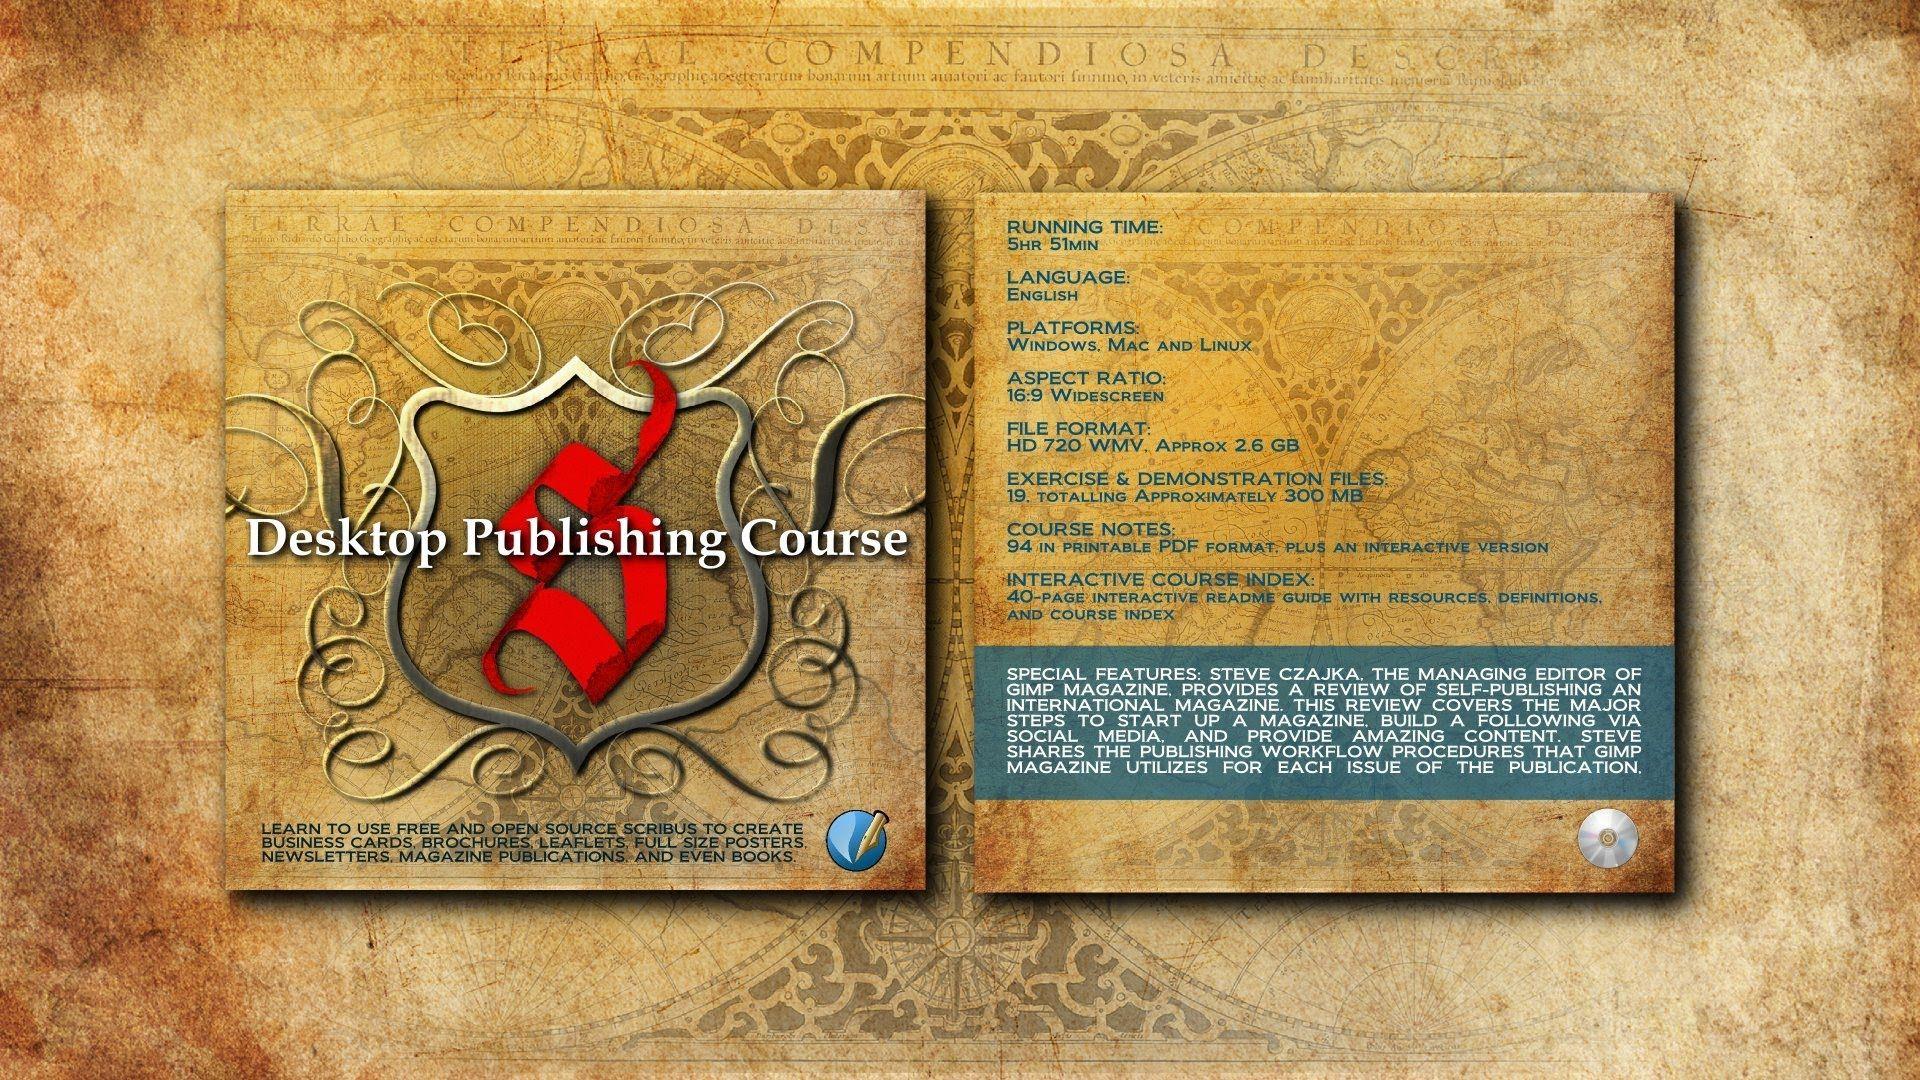 Desktop Publishing Course Using Scribus, an open source